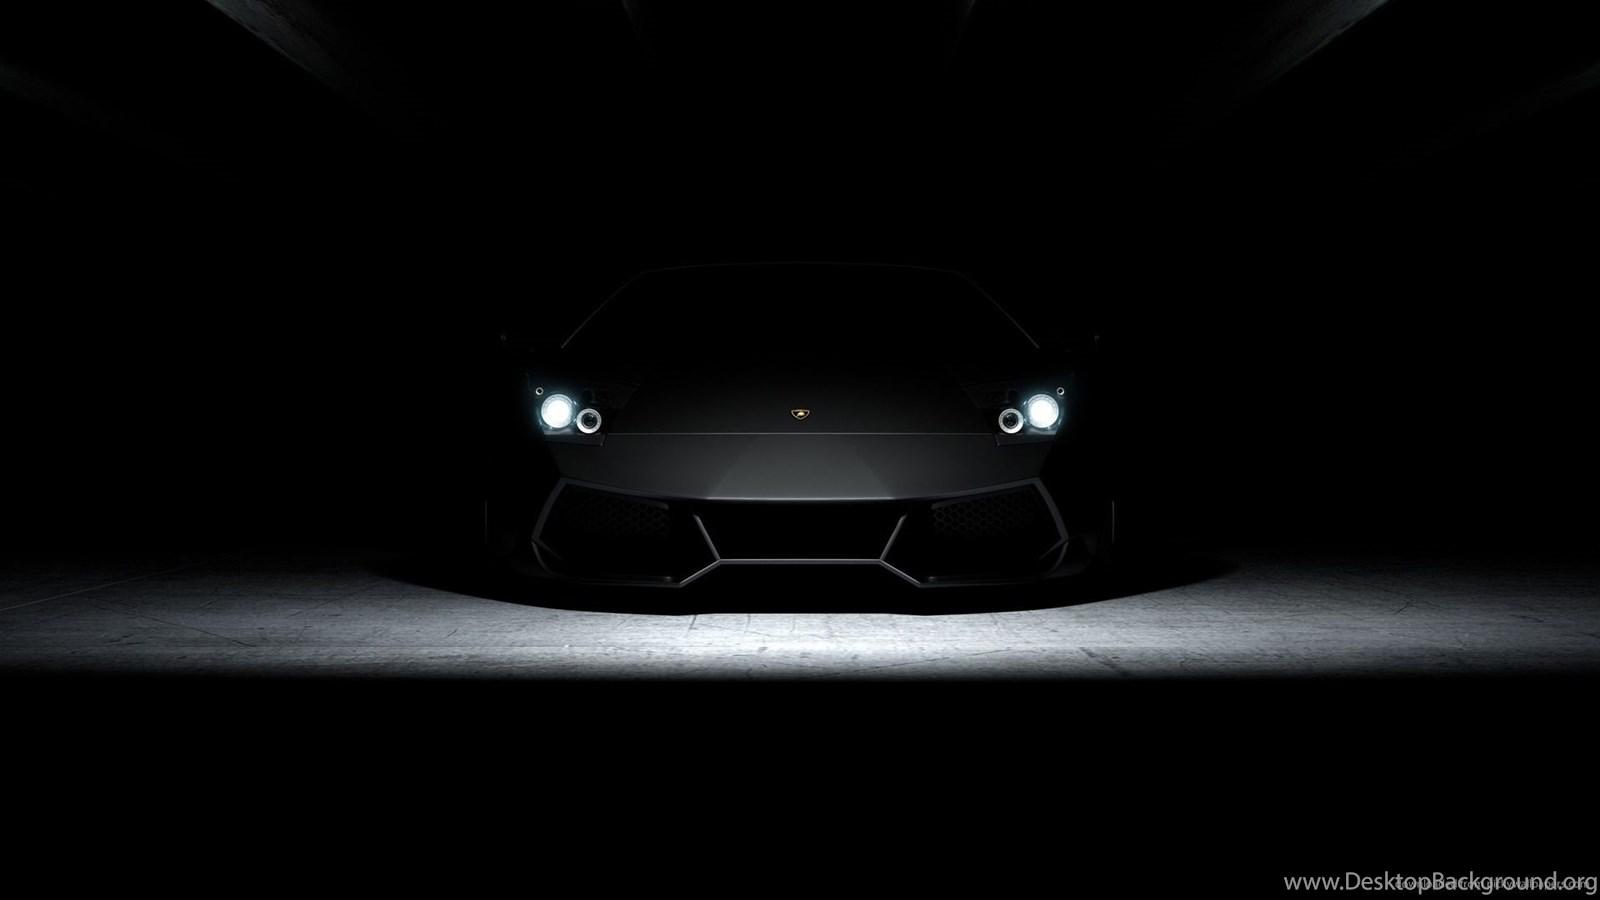 Lamborghini Aventador Wallpapers Hd 1920x1080 8015 1632358 Desktop